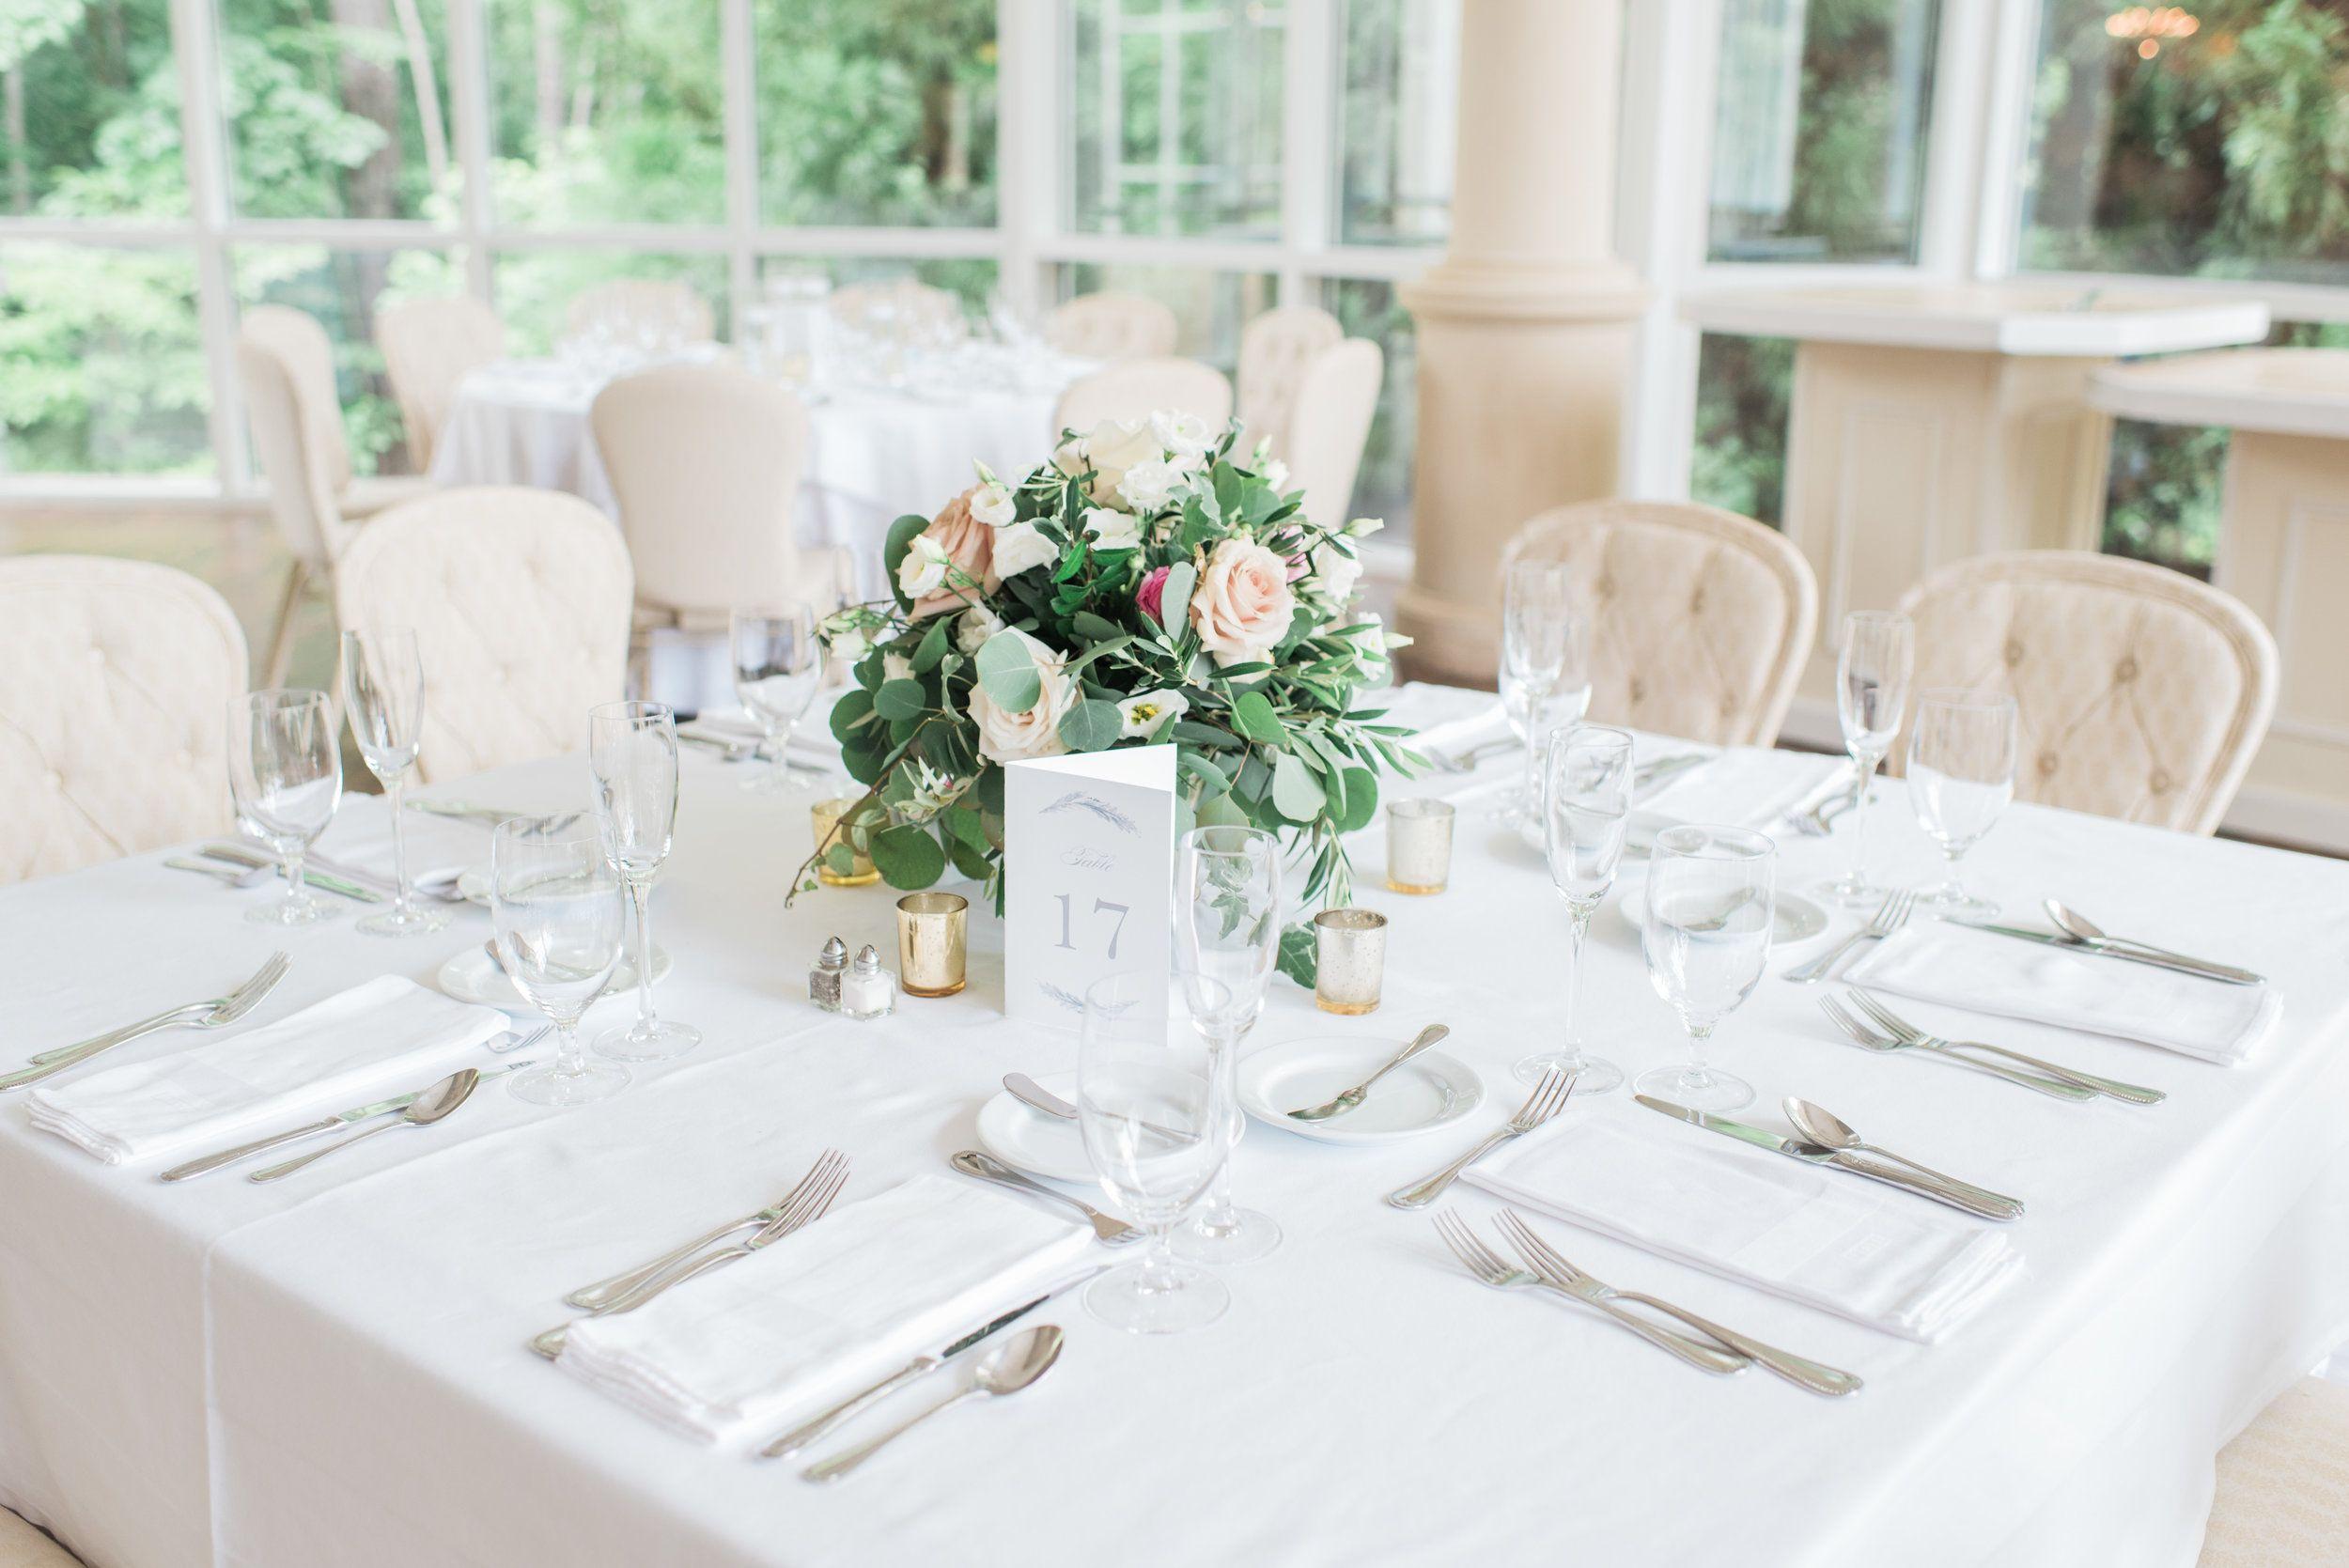 ashton gardens wedding in 2019 Wedding flower